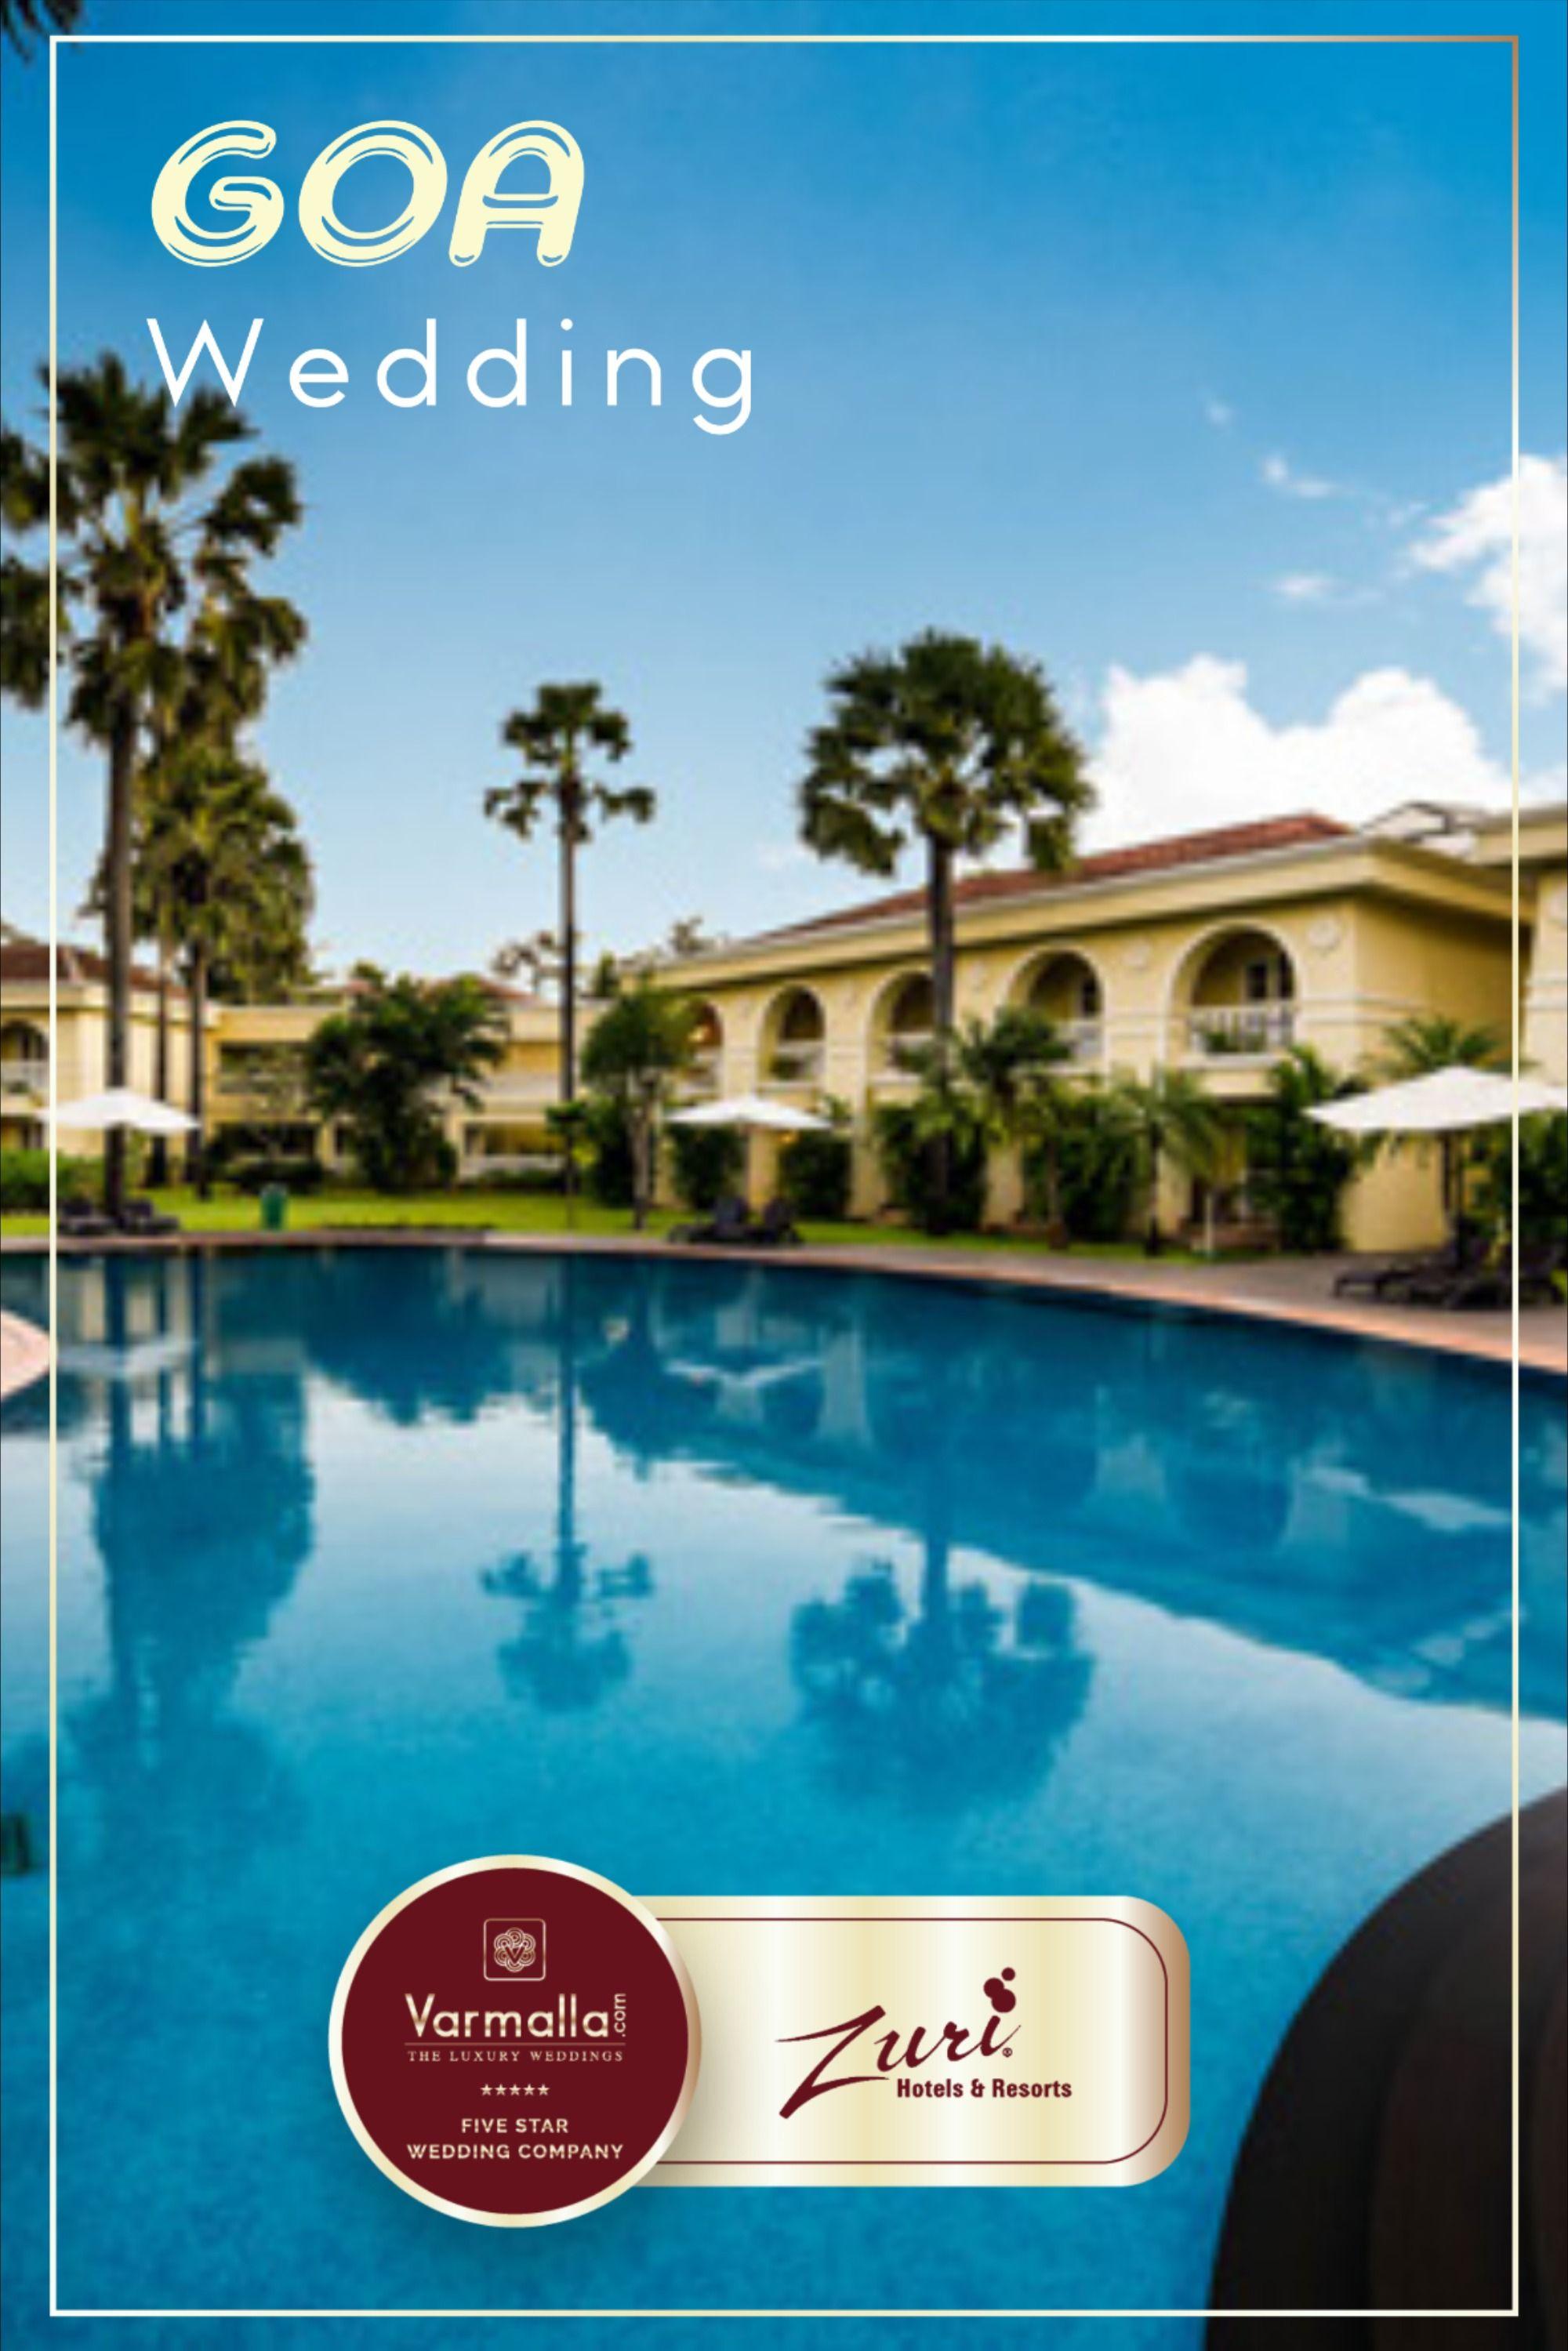 A classy resort with a grand pool...#thezuriwhitesangoa #zuriwhitesand #zuriwhitesandgoahotel #hyattgoa #tajvivantainpanjimgoa #tajfortaguadaresort&spagoa #tajmahal #tajpalace #goa #goaindia #goataco #weddinginvitationcards #honeymoon #honeymoonpackages #bridallehenga #bridalmakeup #bridalmehndidesign #bridalmehndi #Bridalsaree #bridaljewellery #bride #indianbride #bridegroom #eventmanagement #weddingplanner #weddinginvitationcards #destination #destinationwedding #weddingdecorations#weddinggift